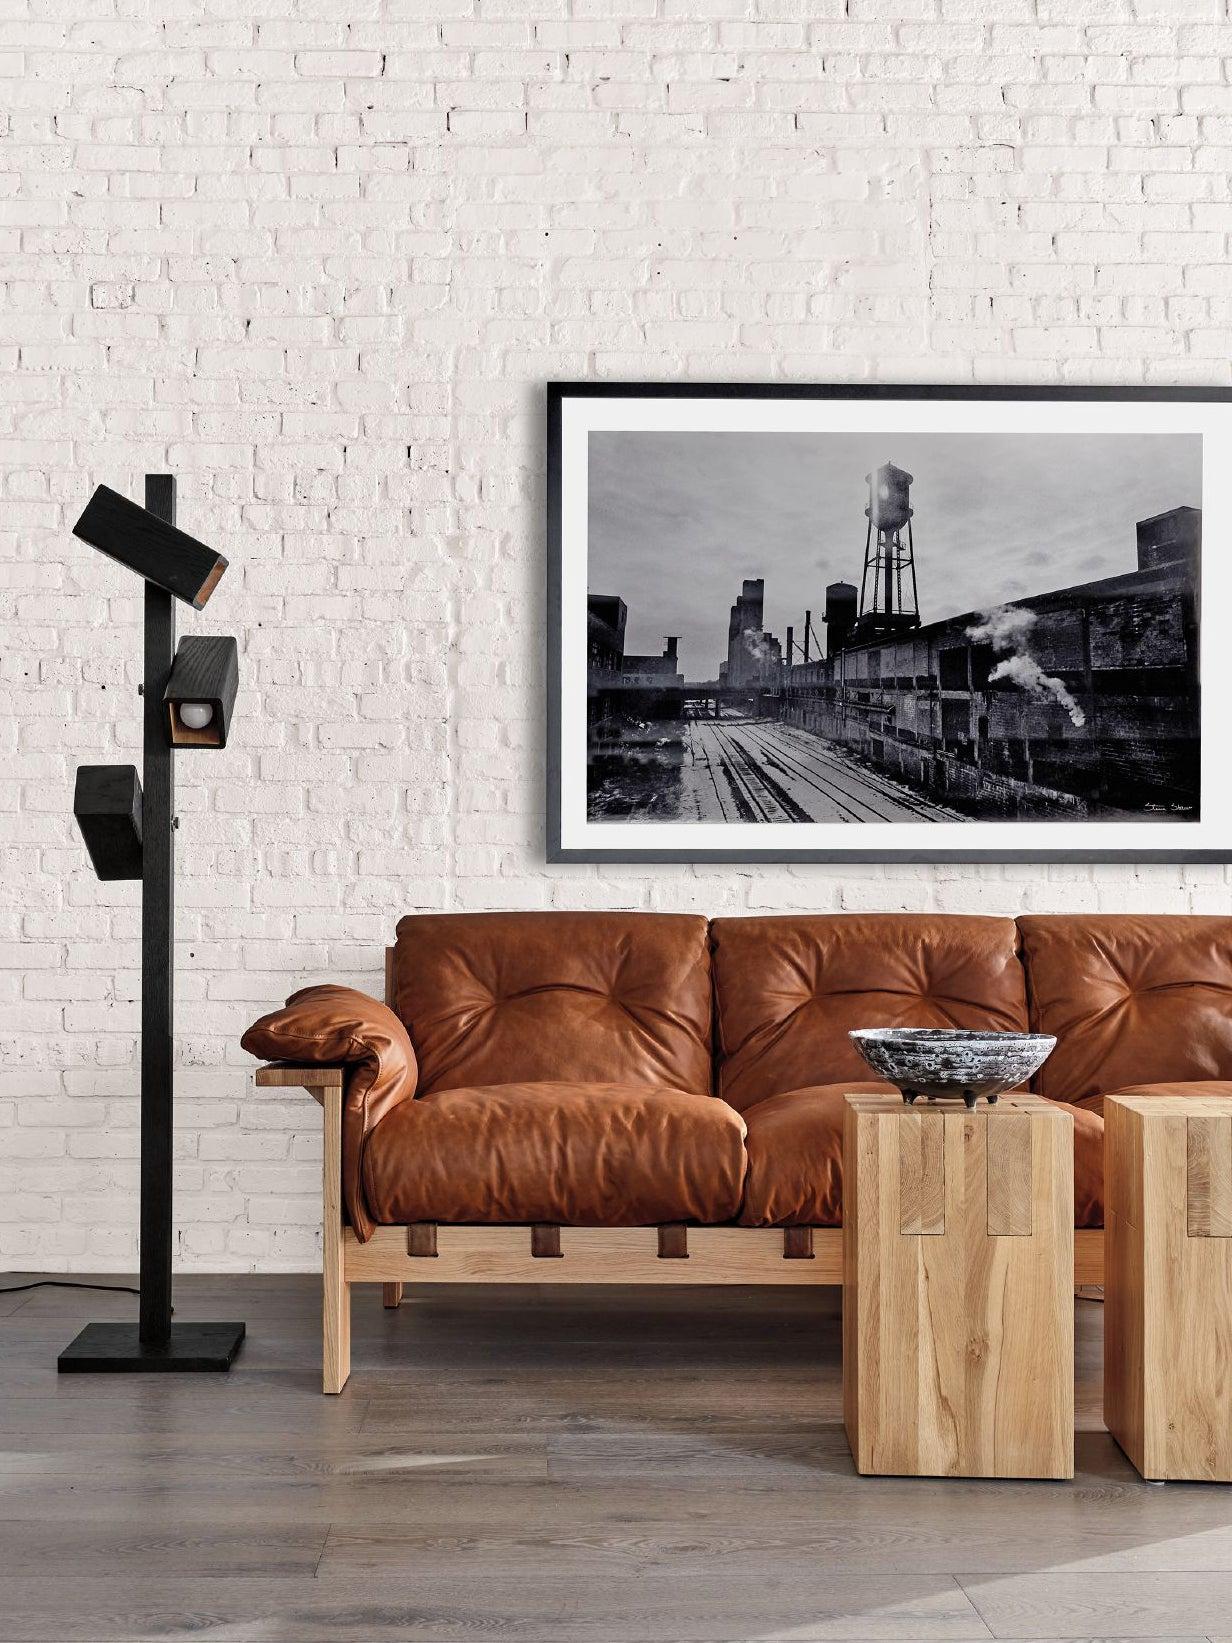 new-leather-sofa-Shinola-Crate-Barrel-domino